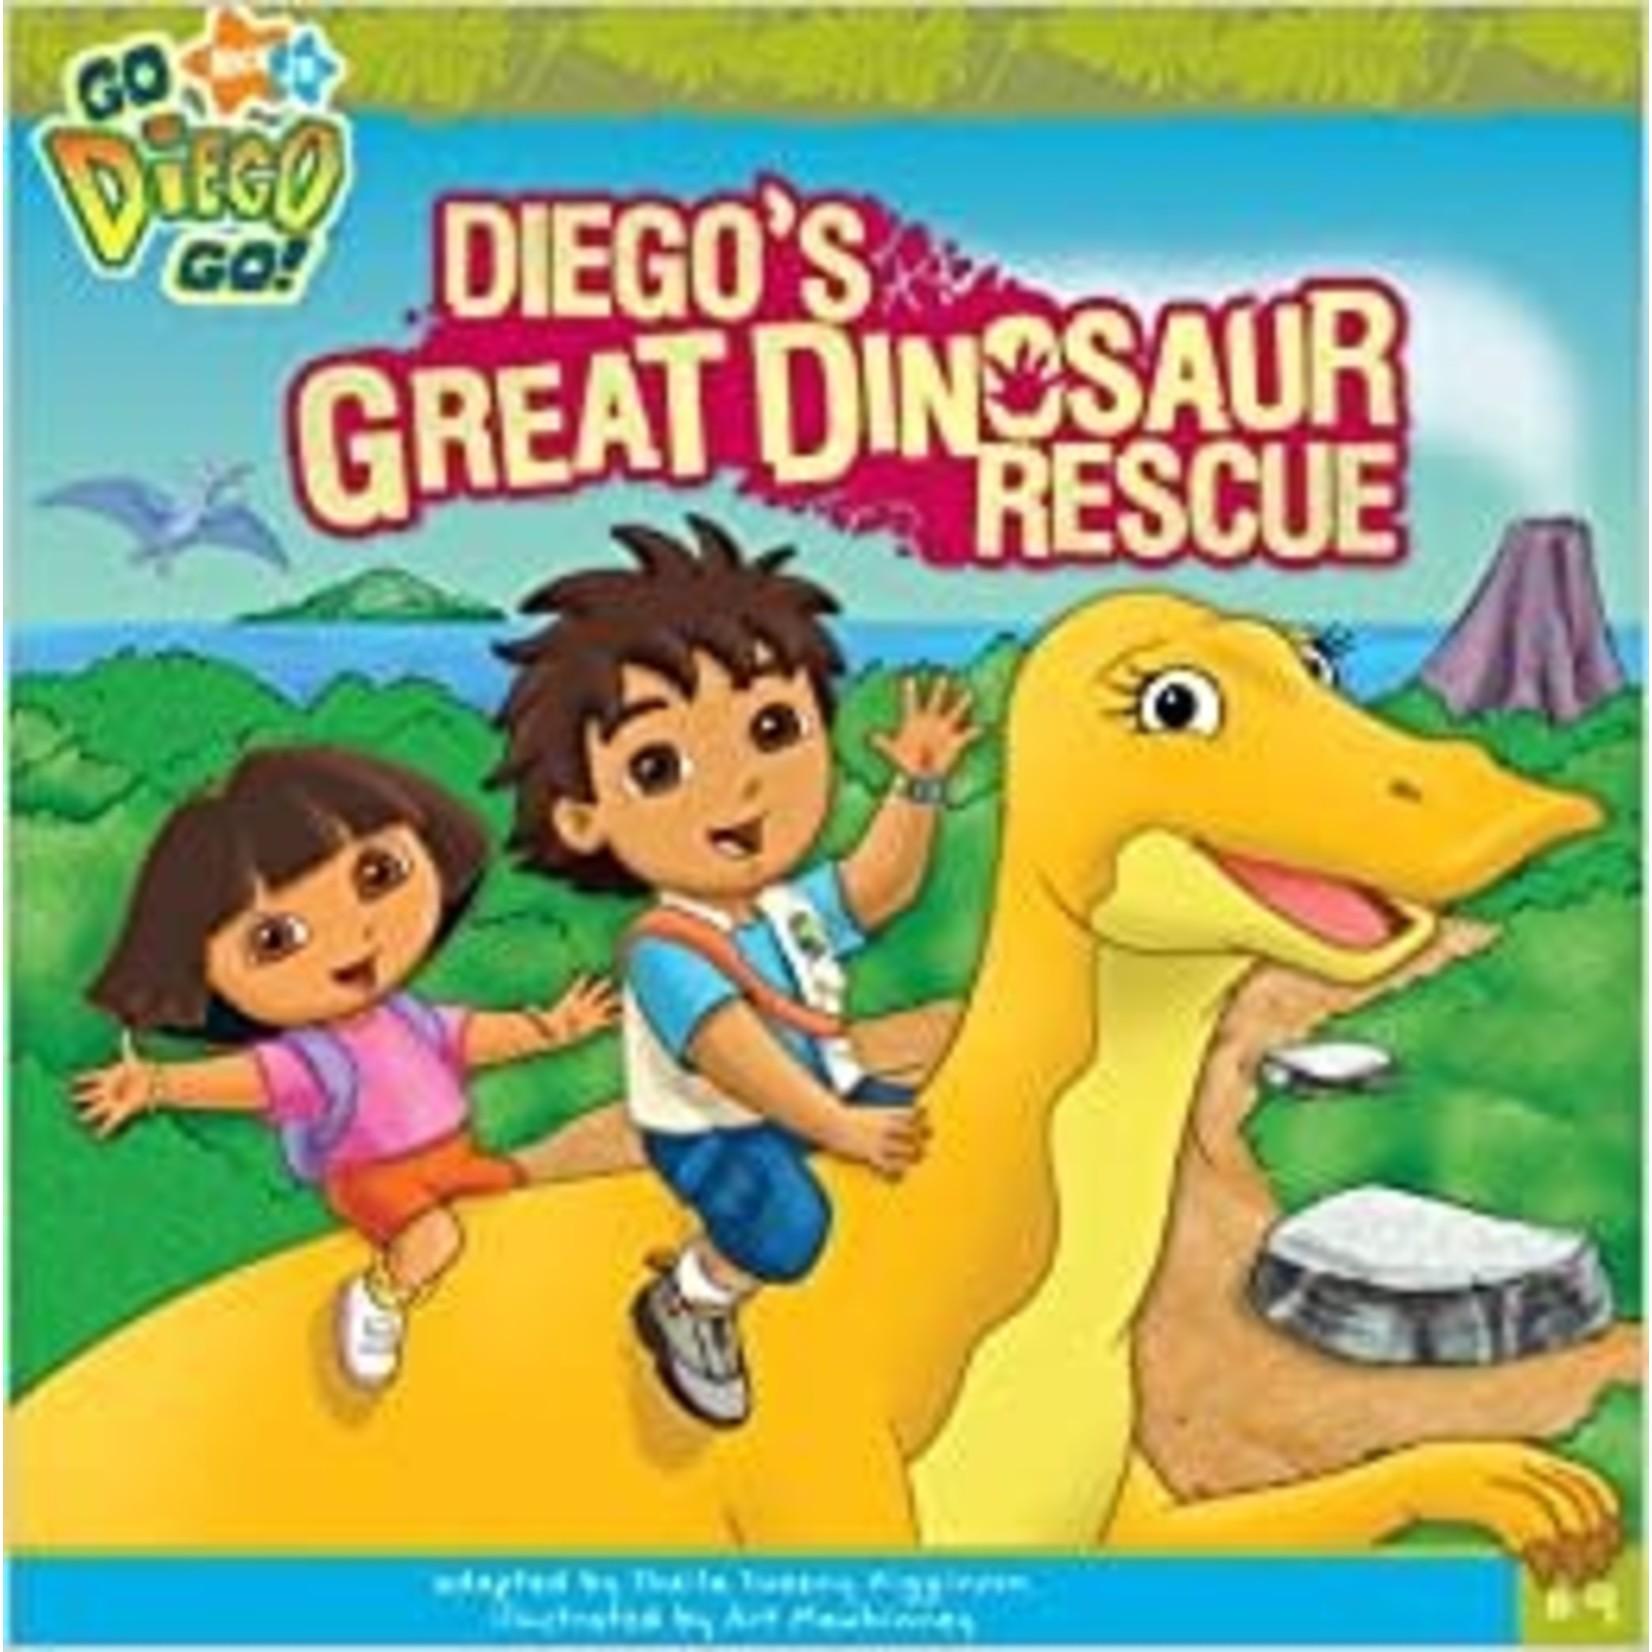 DSU-Go, Diego, Go: Great Dinosaur Rescue (Chip Only)